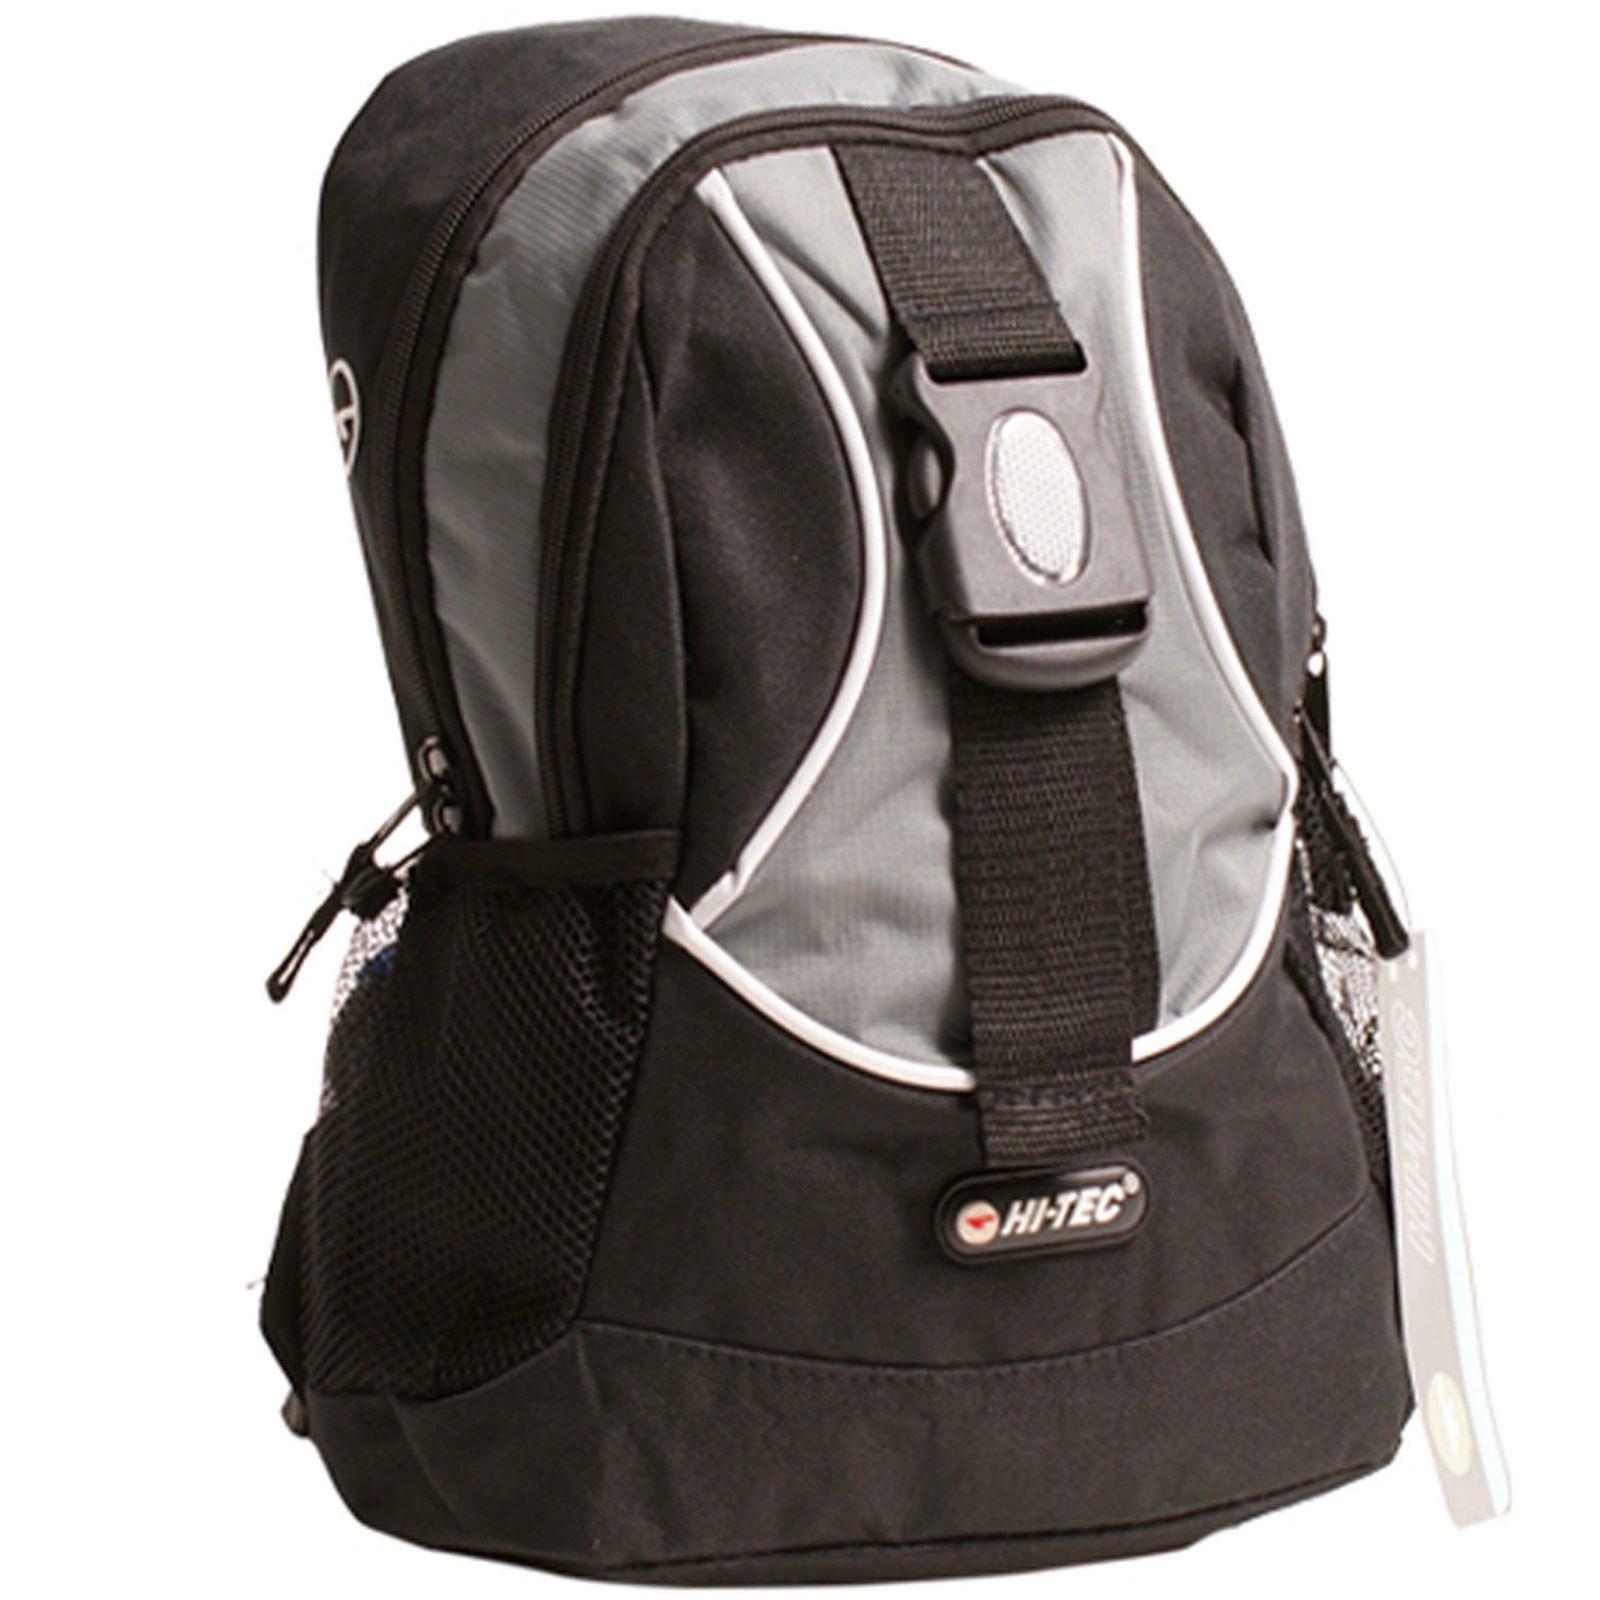 3701f8b20506 Kids Boys Girls Backpack School Bag Sport Hi-Tec Work Gym Travel Unisex.  Product Details